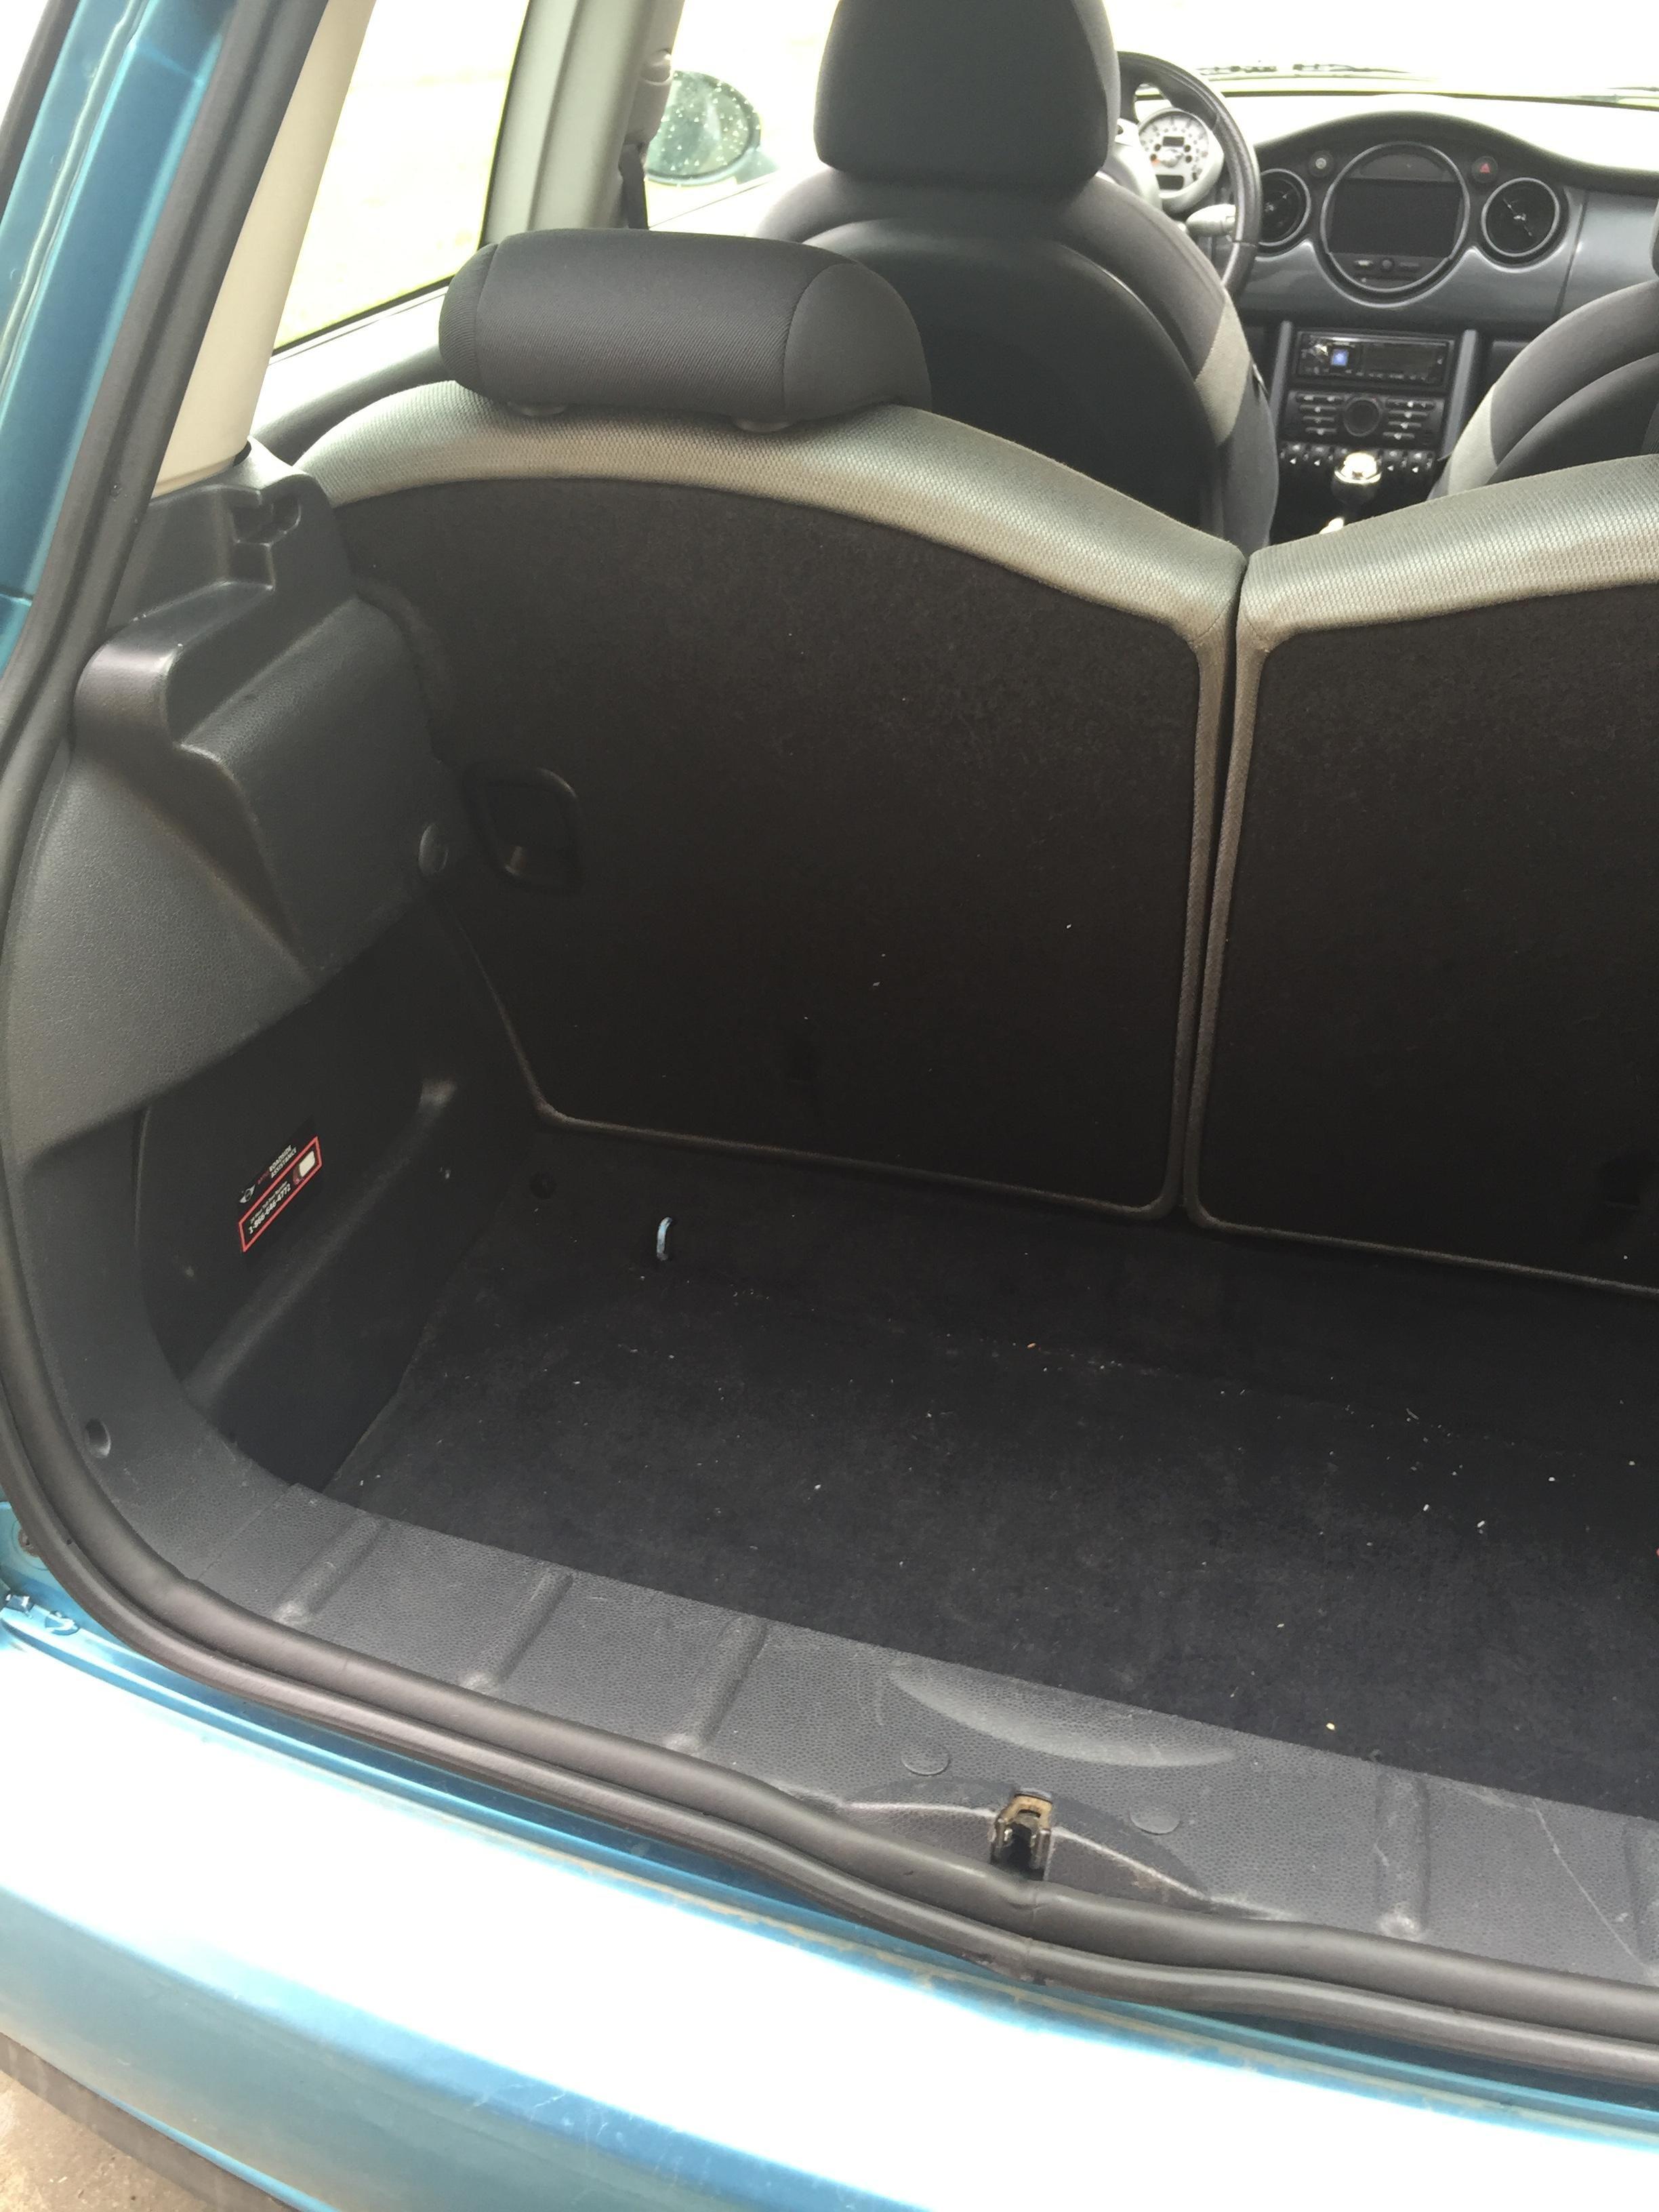 I Built A Fiberglass Sub Box For My R53 Mini Cooper Handmade Crafts Howto Diy Sub Box Mini Cooper Fiberglass